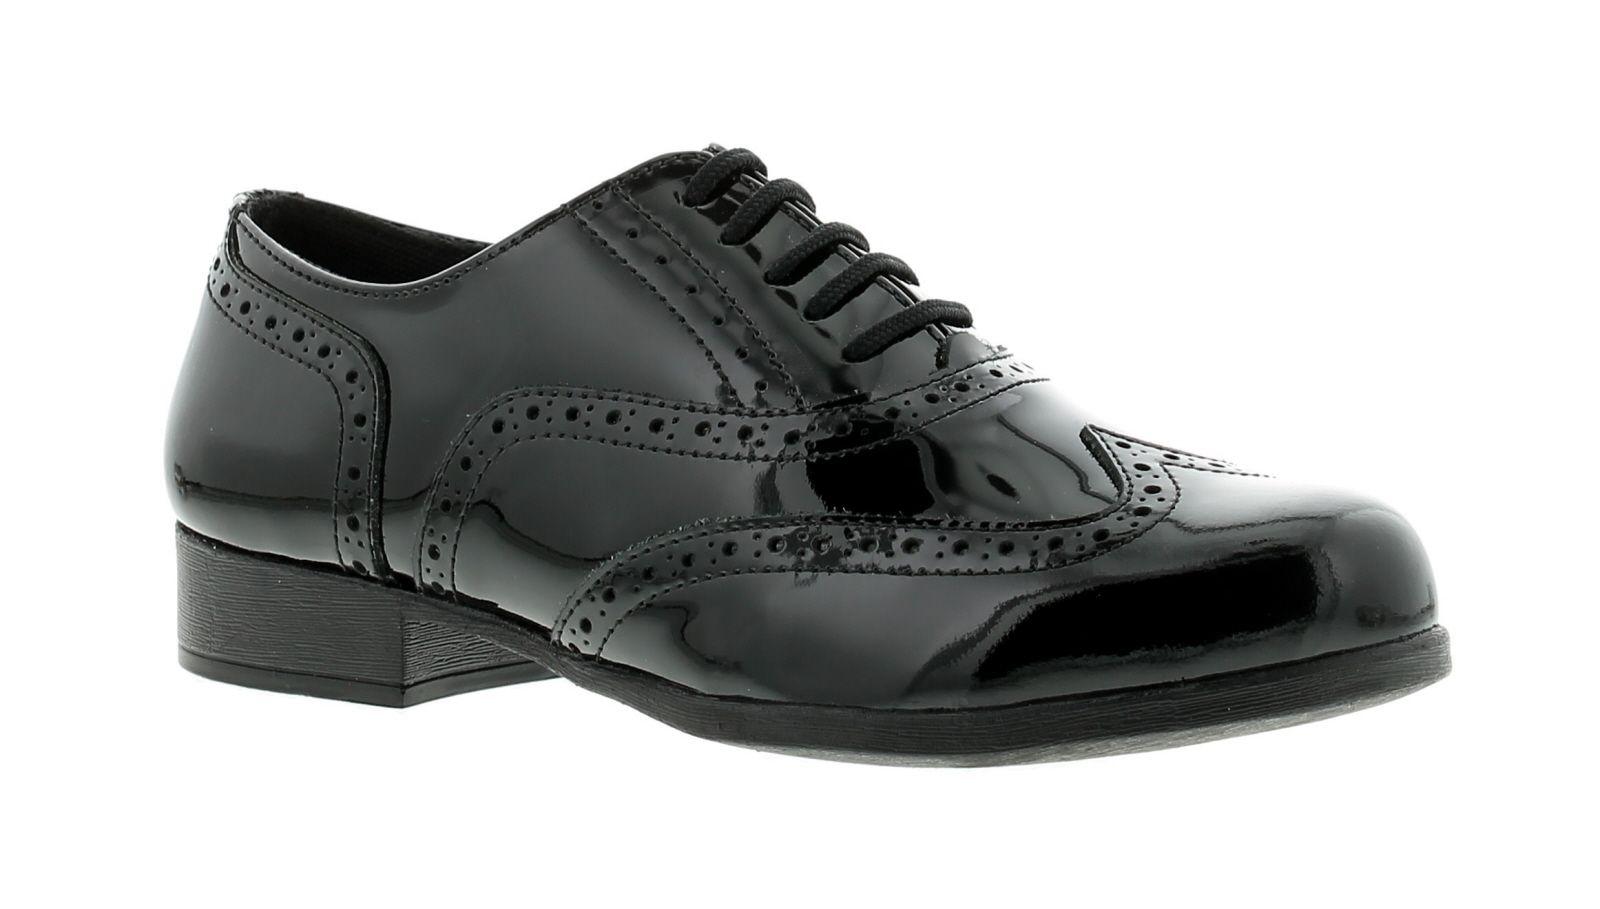 Hush Puppies kada Womens Flat Shoes black